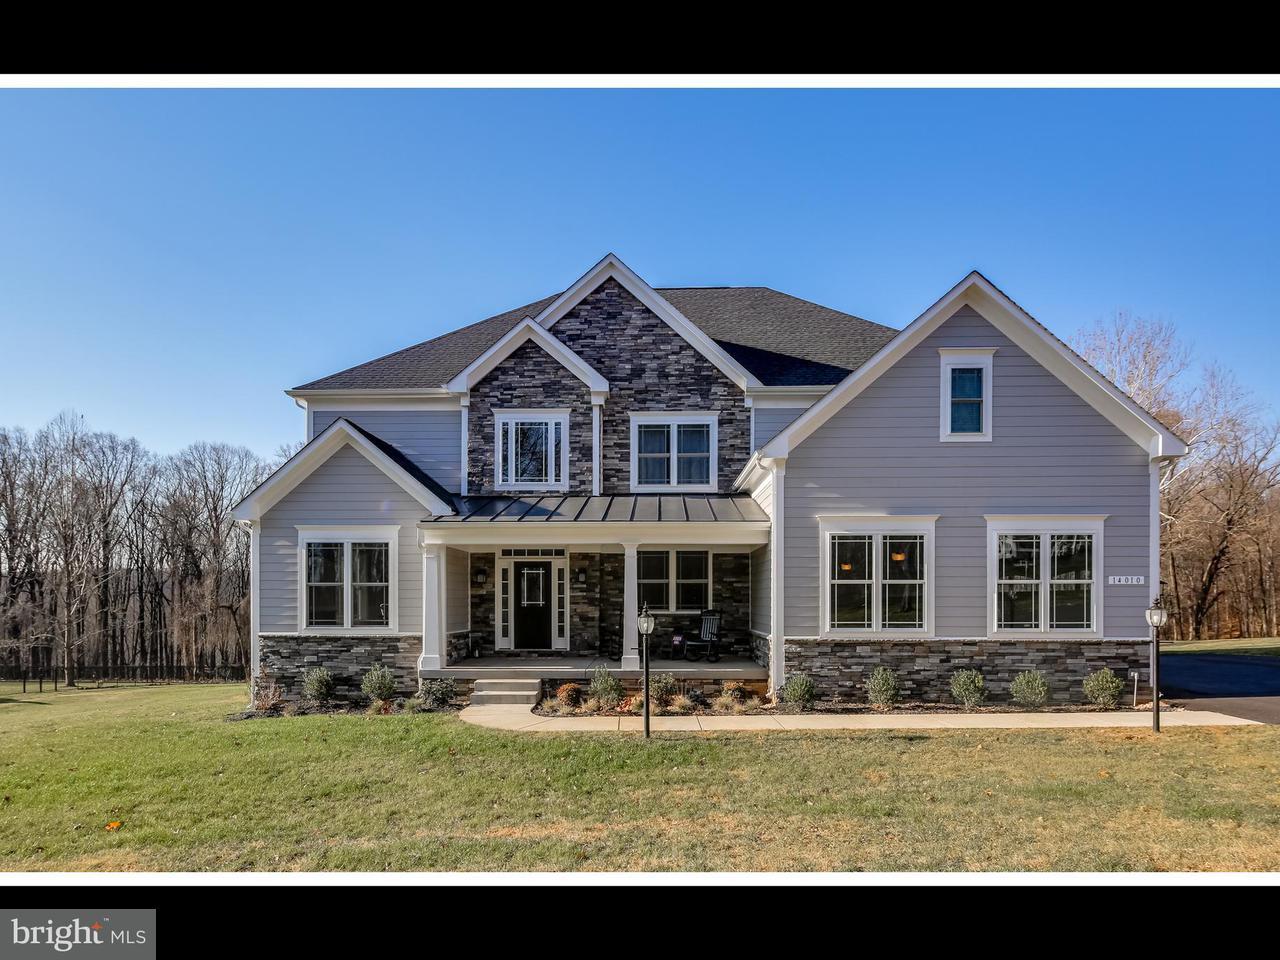 Частный односемейный дом для того Продажа на 703 HILLSTEAD Drive 703 HILLSTEAD Drive Lutherville Timonium, Мэриленд 21093 Соединенные Штаты